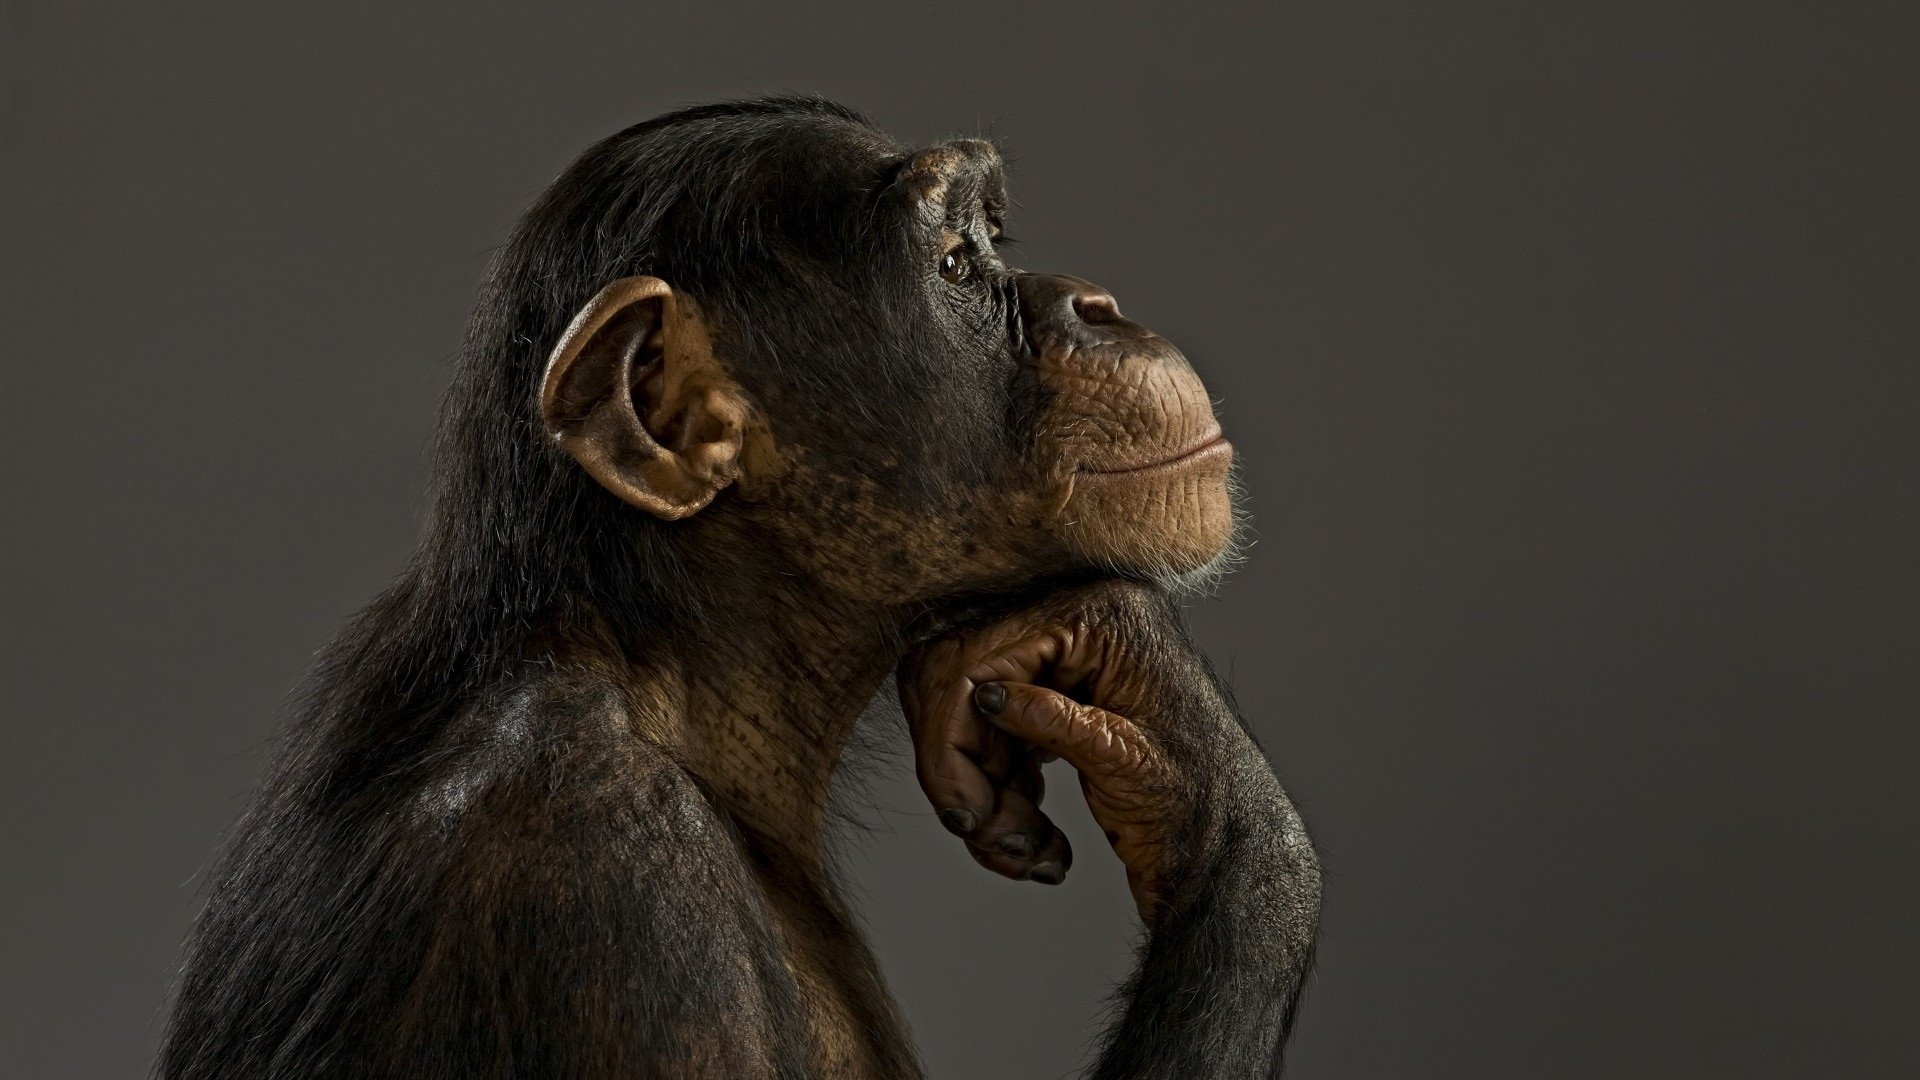 Thinking Cute Monkey 221926 Hd Wallpaper Backgrounds